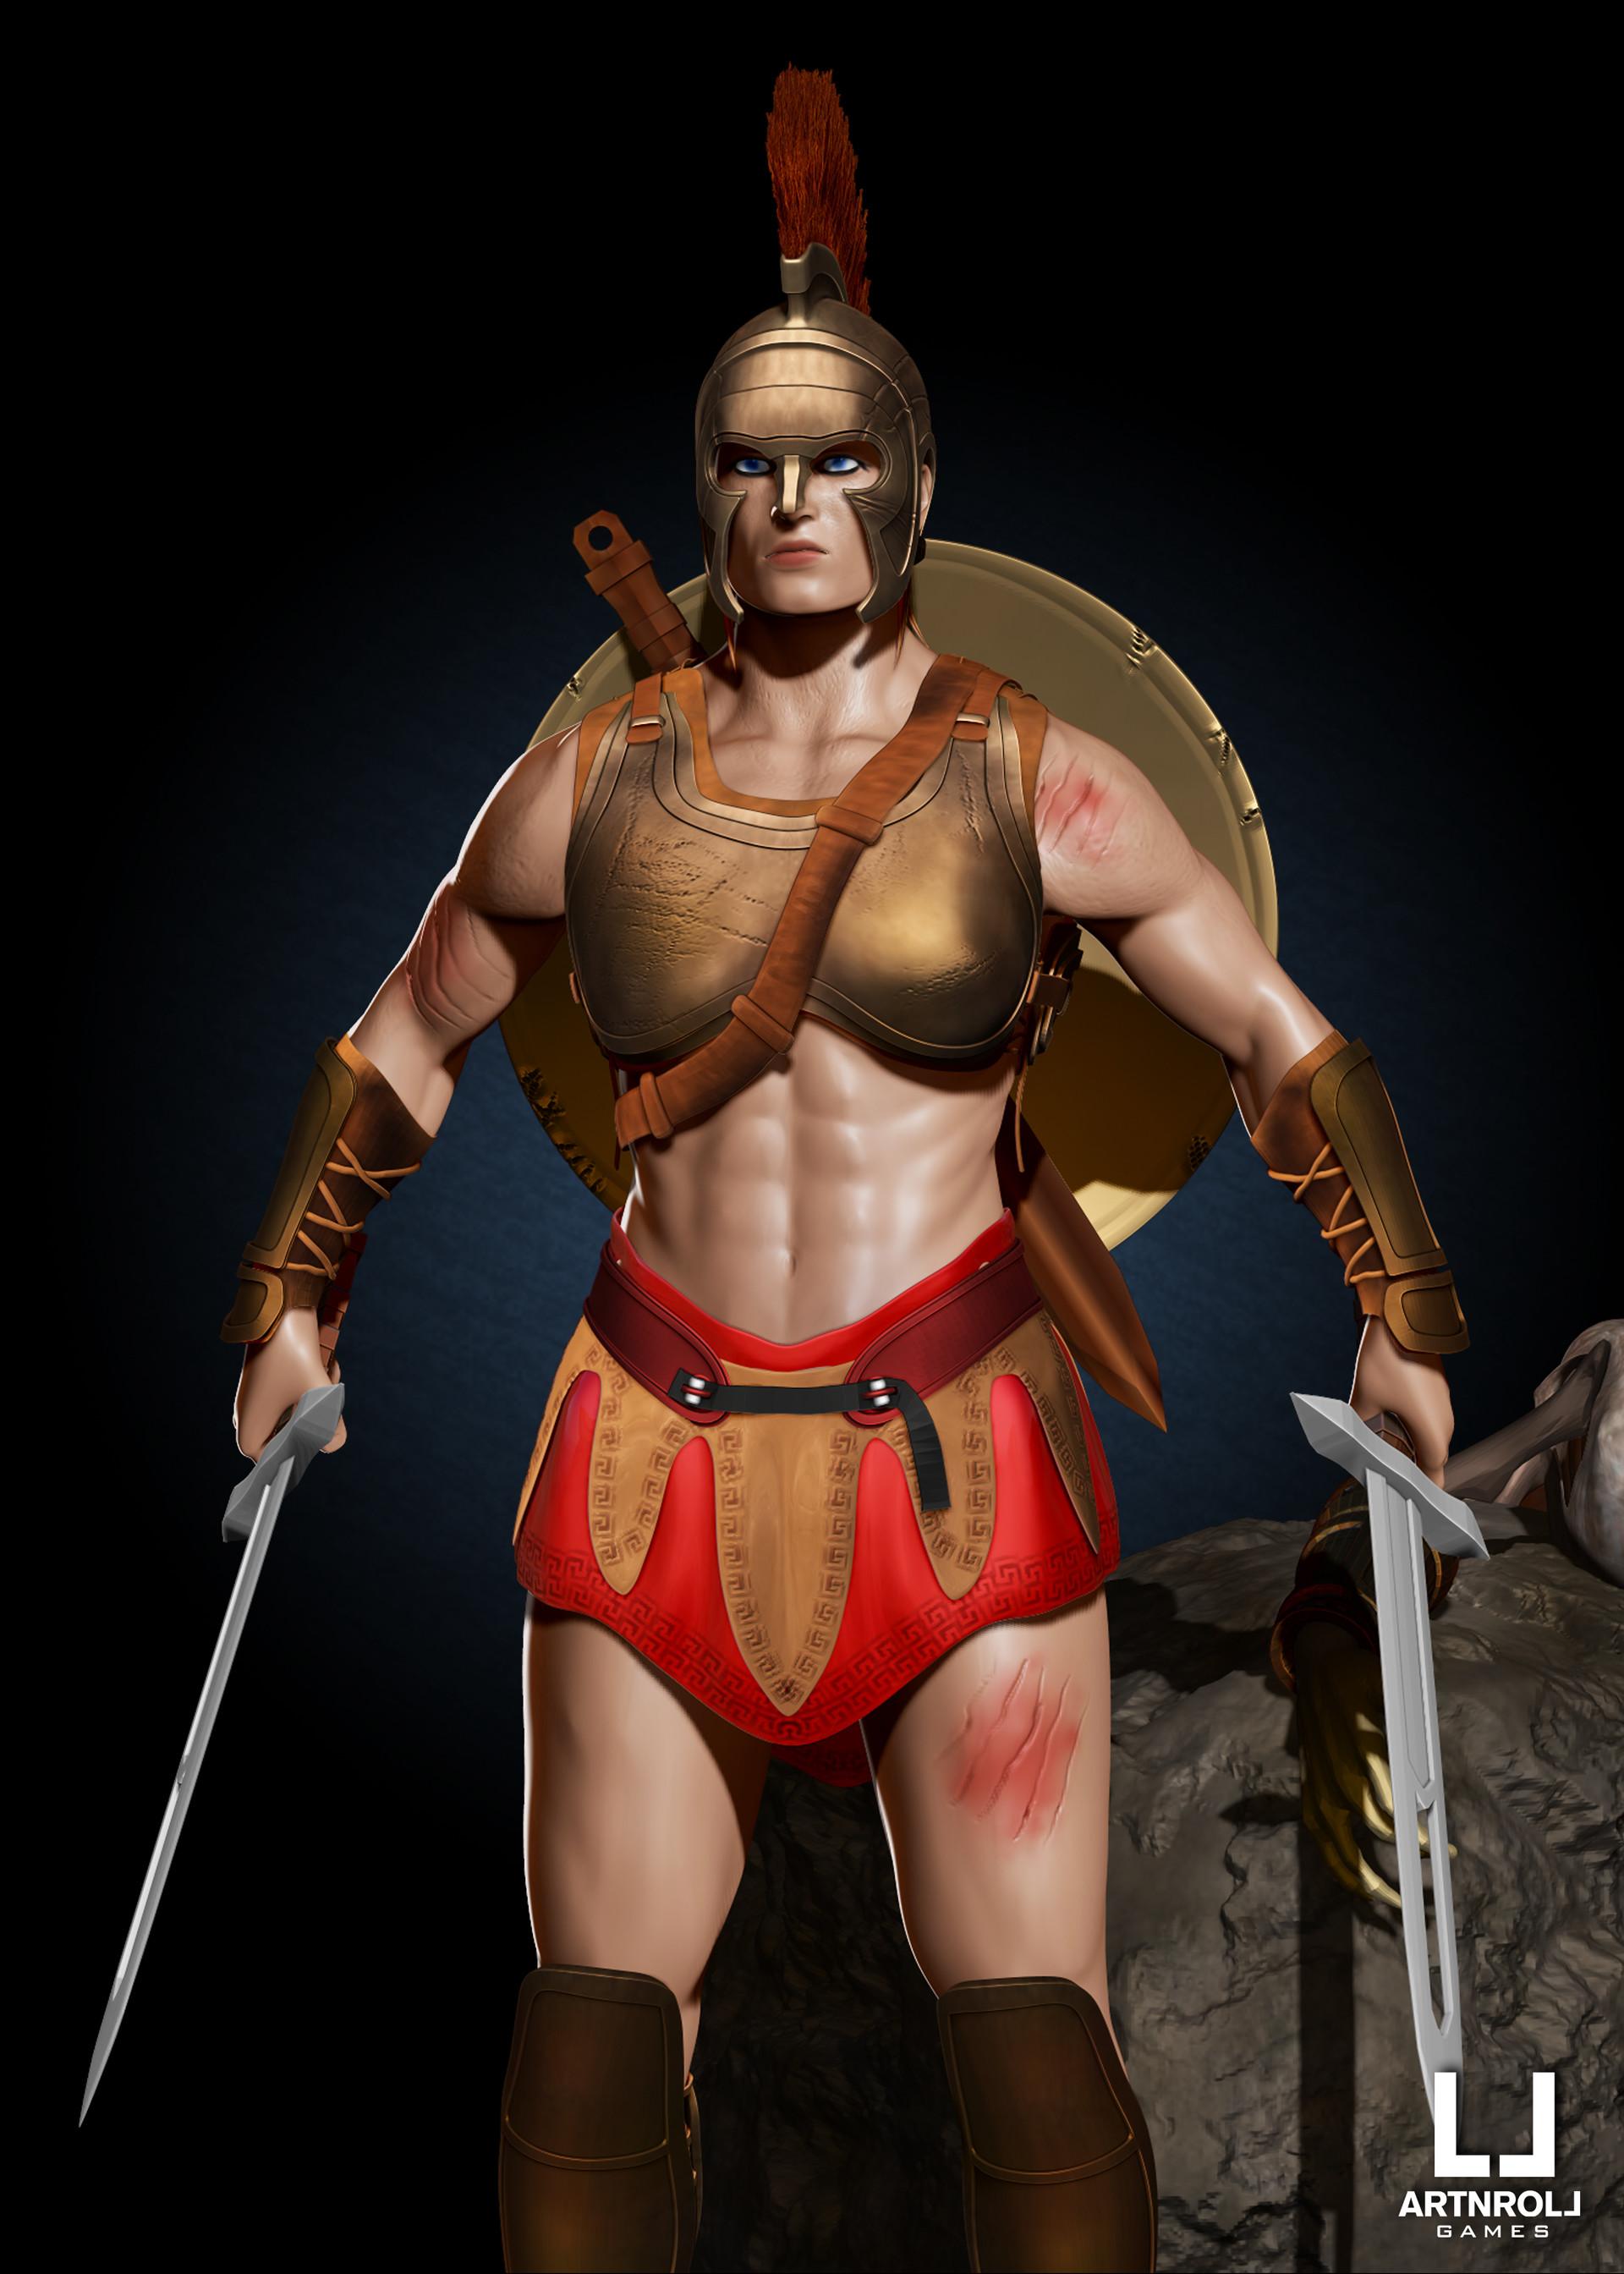 Amazon Warriors Fotos artnroll studio - amazon warrior